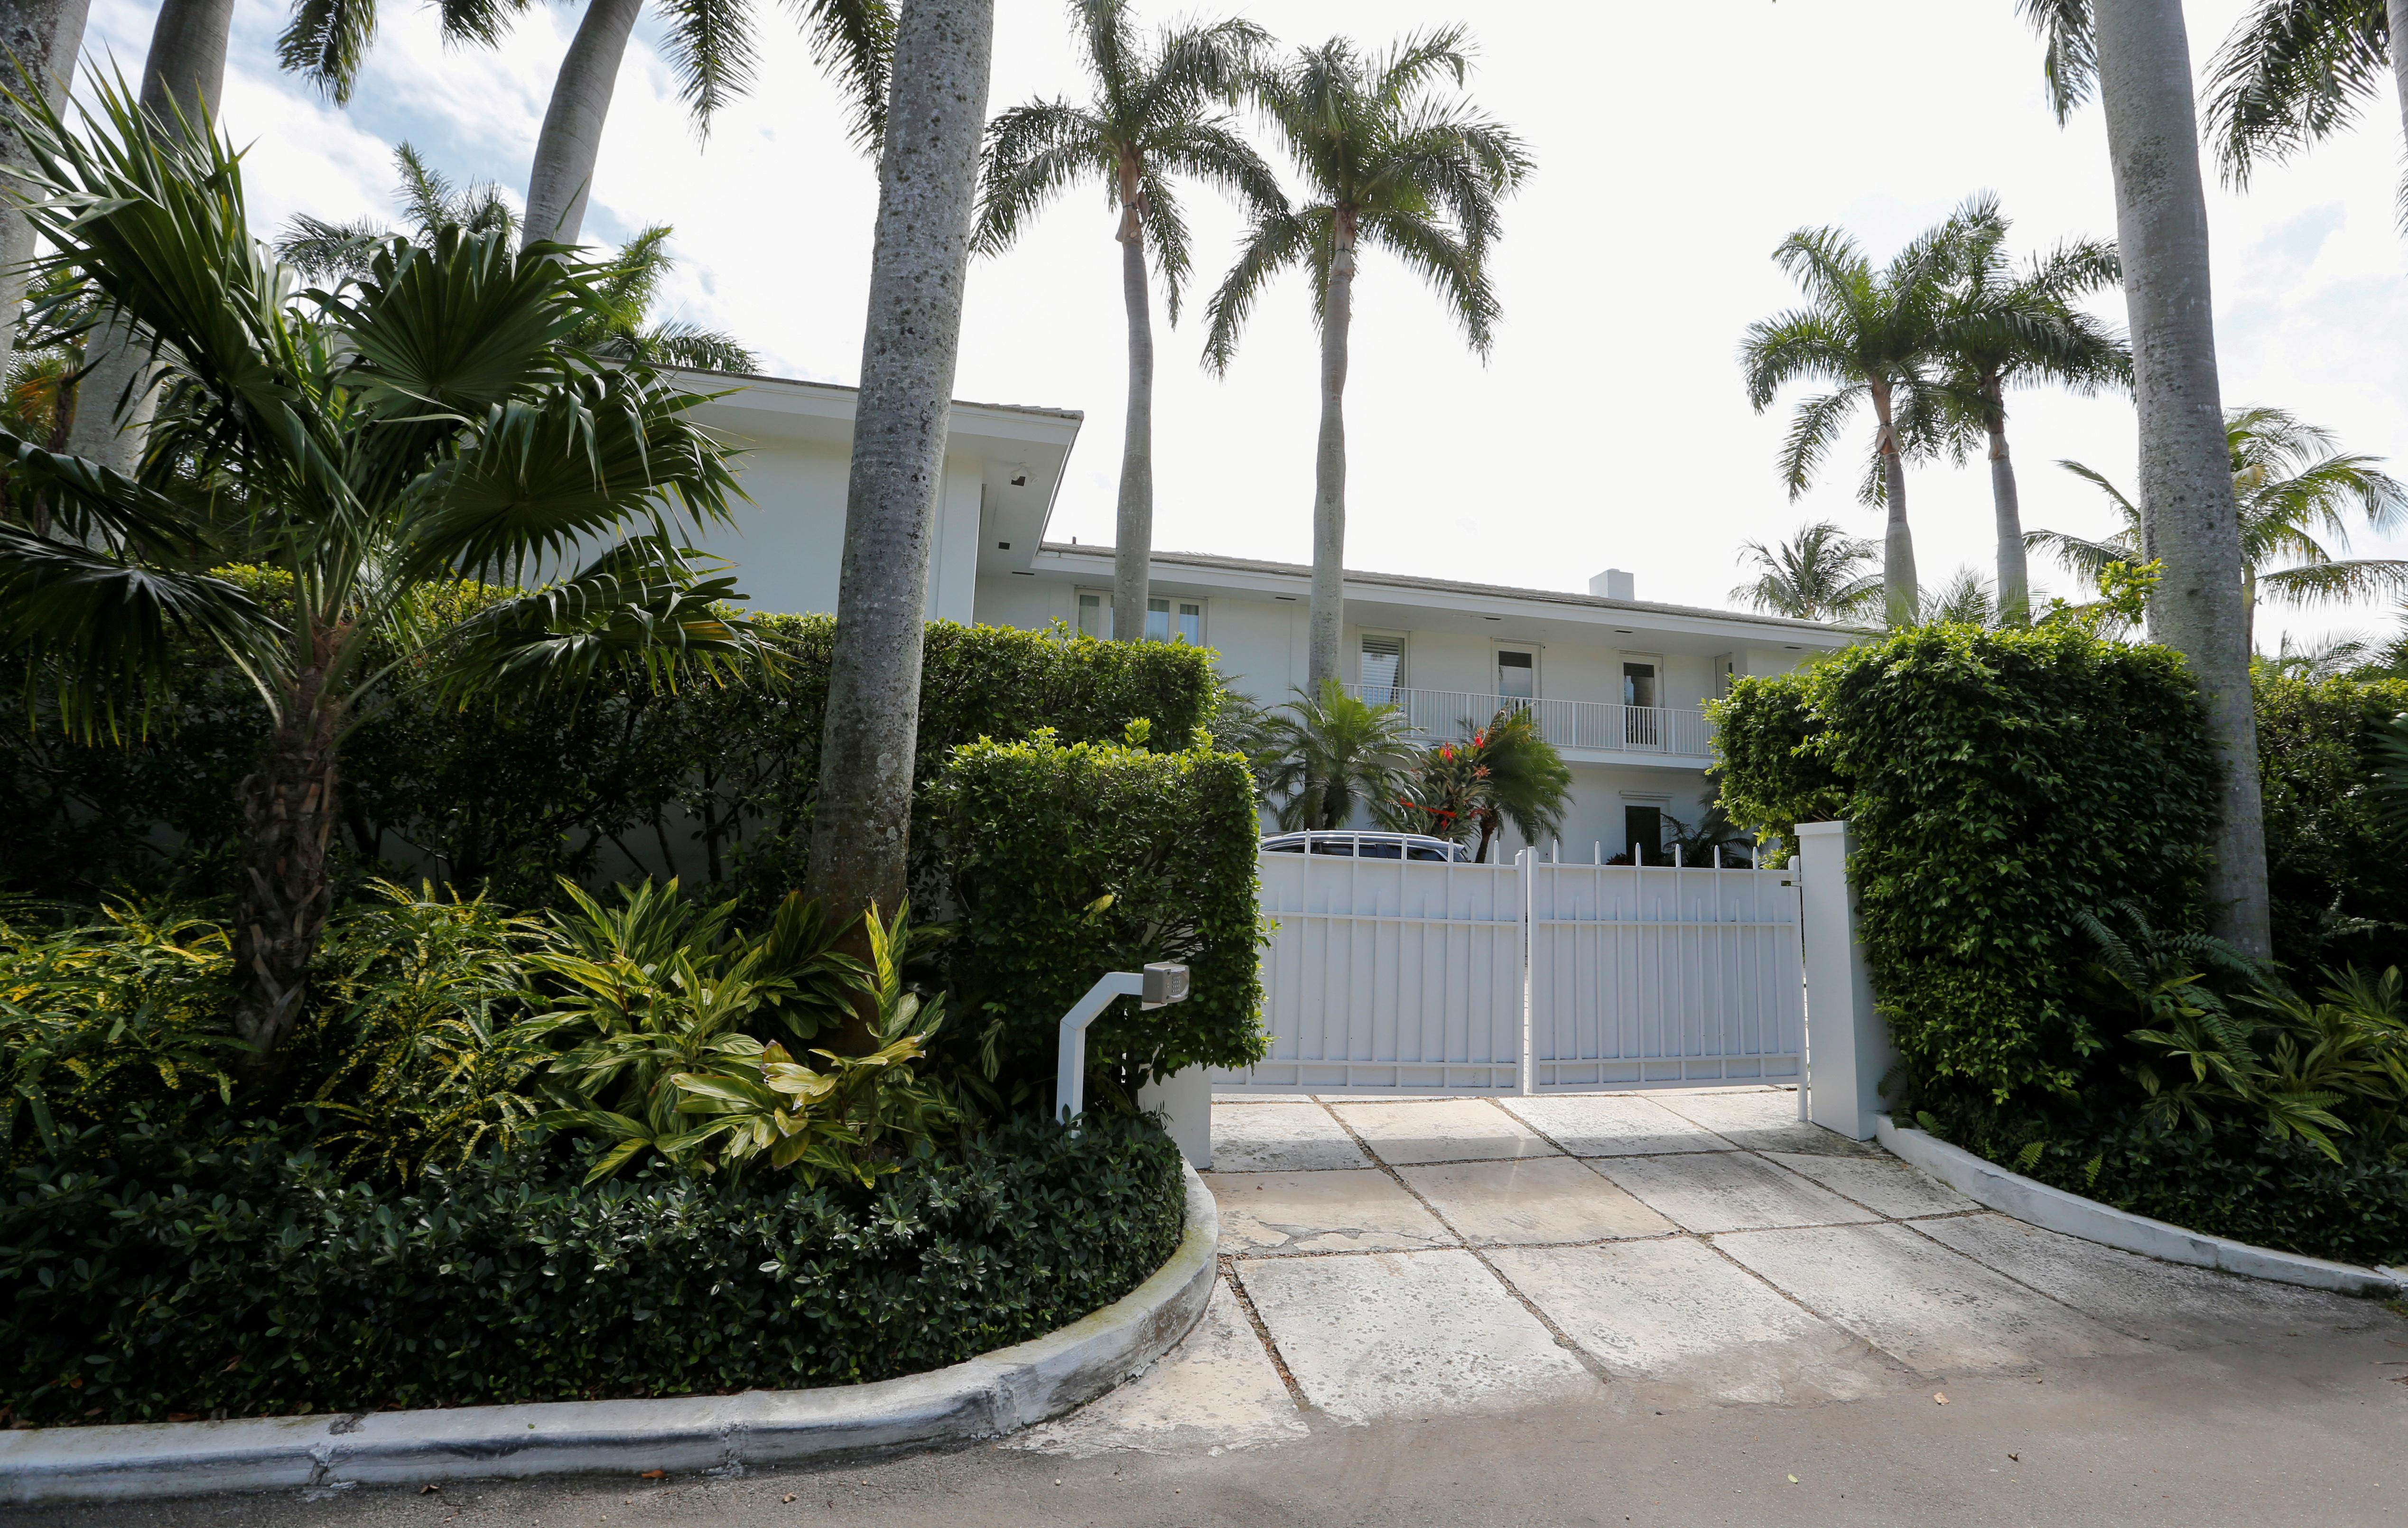 FILE PHOTO: A residence of financier Jeffrey Epstein is shown in Palm Beach, Florida, U.S., March 14, 2019. Picture taken March 14, 2014. REUTERS/Joe Skipper/File Photo